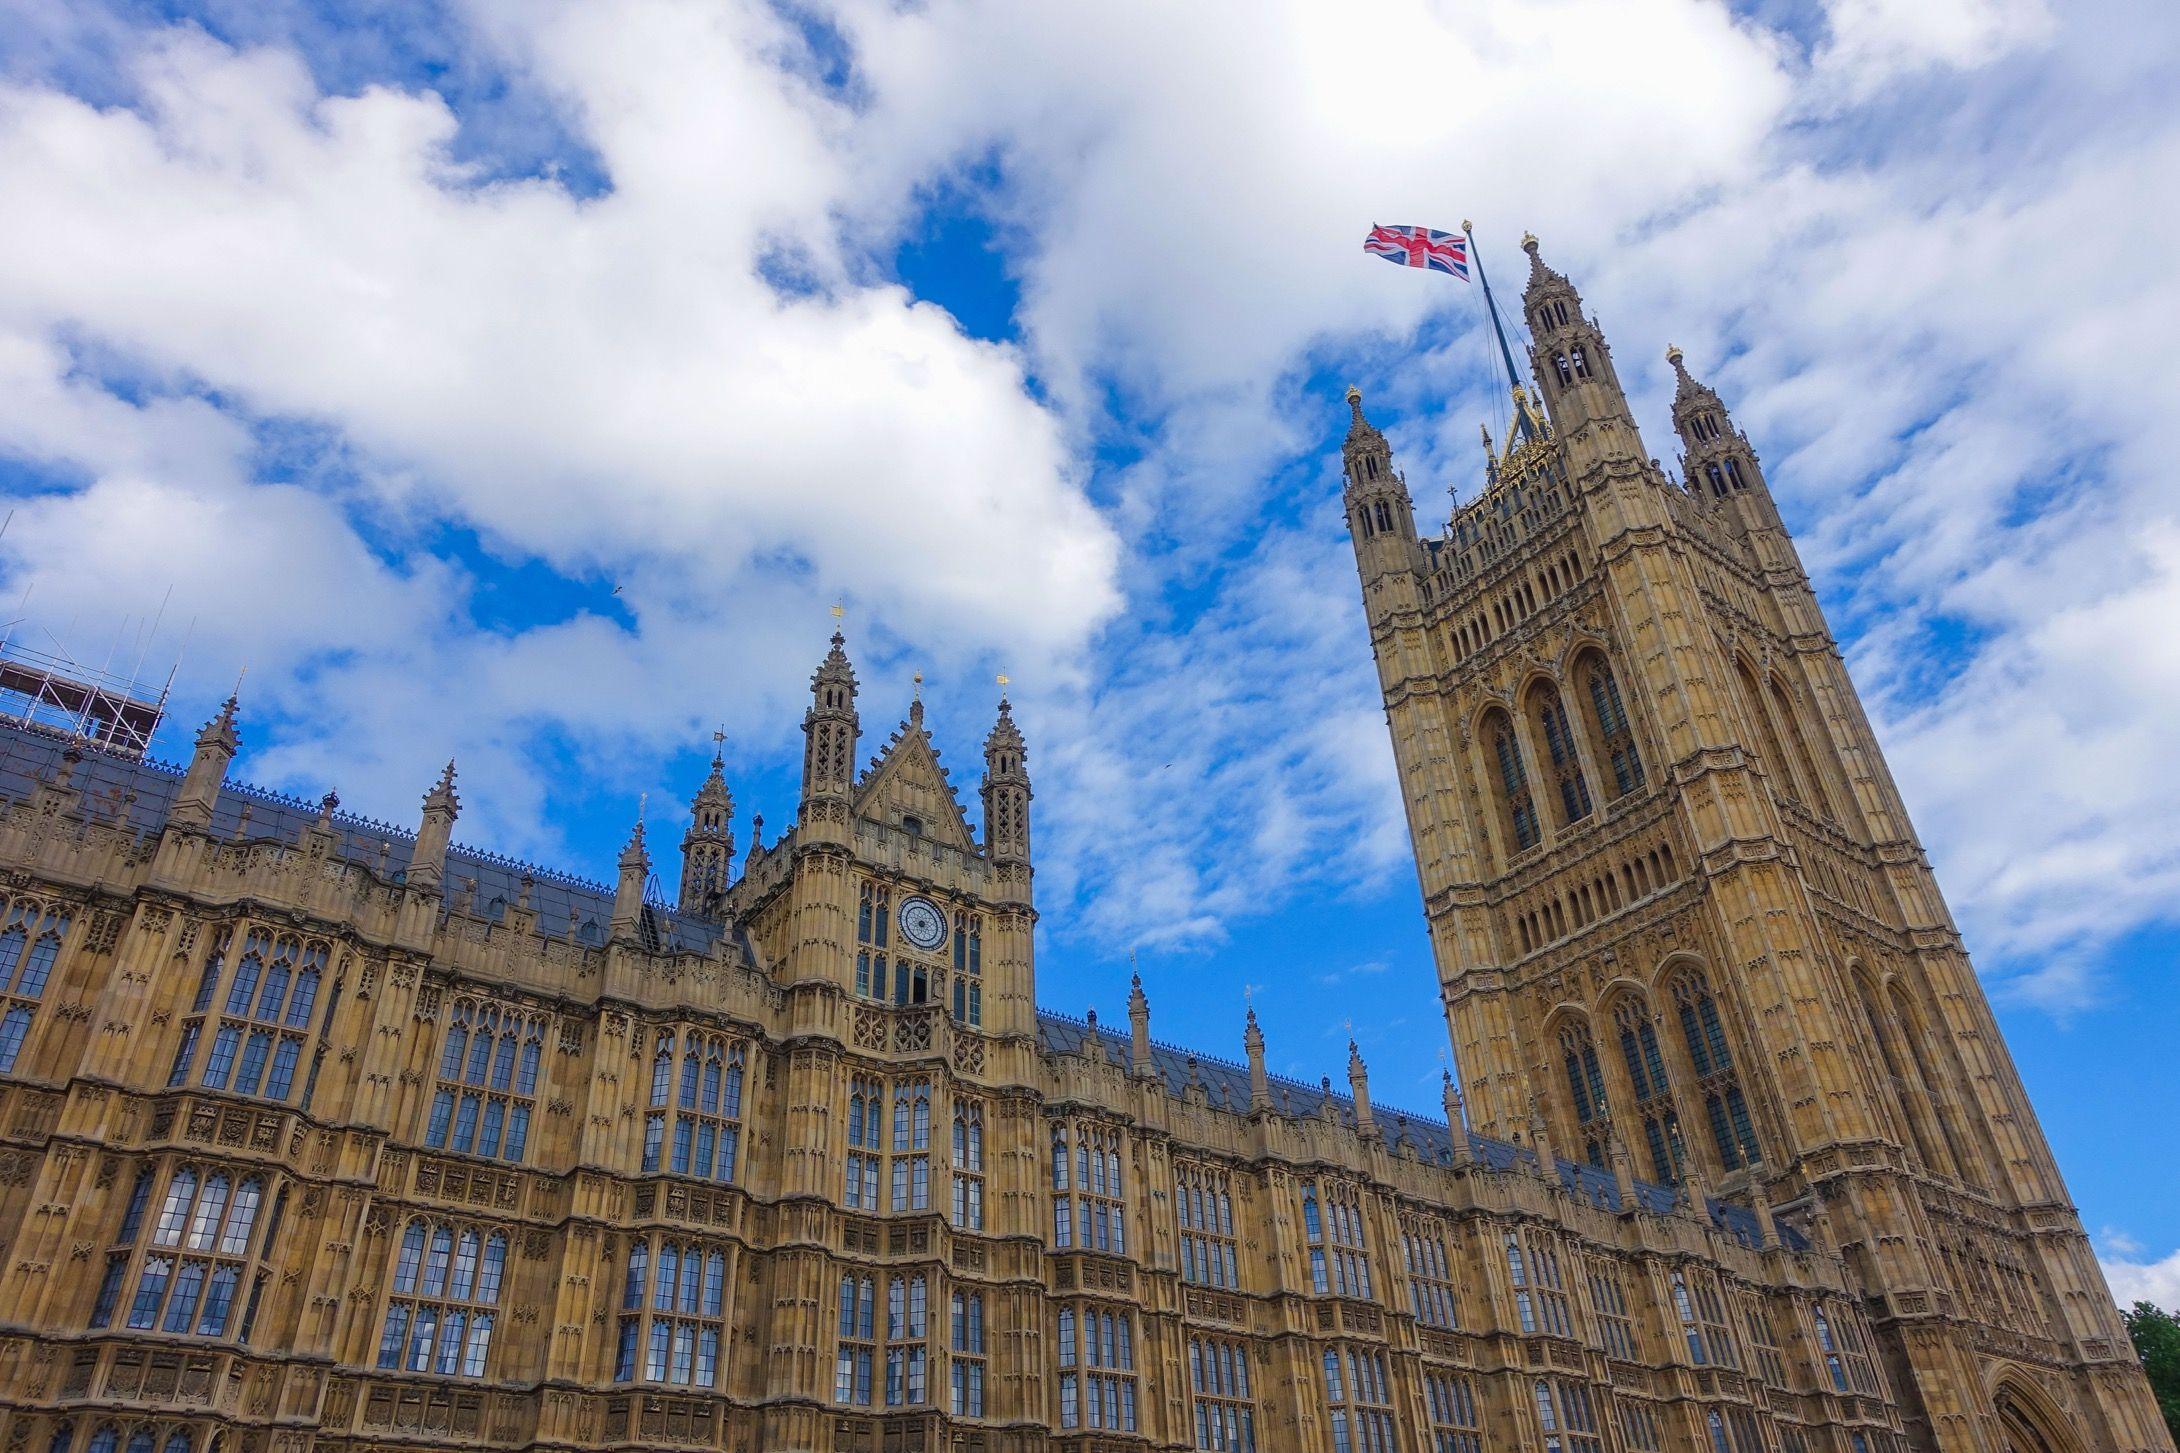 Palace of Westminster - Mer enn bare Big Ben | Reisegal.no